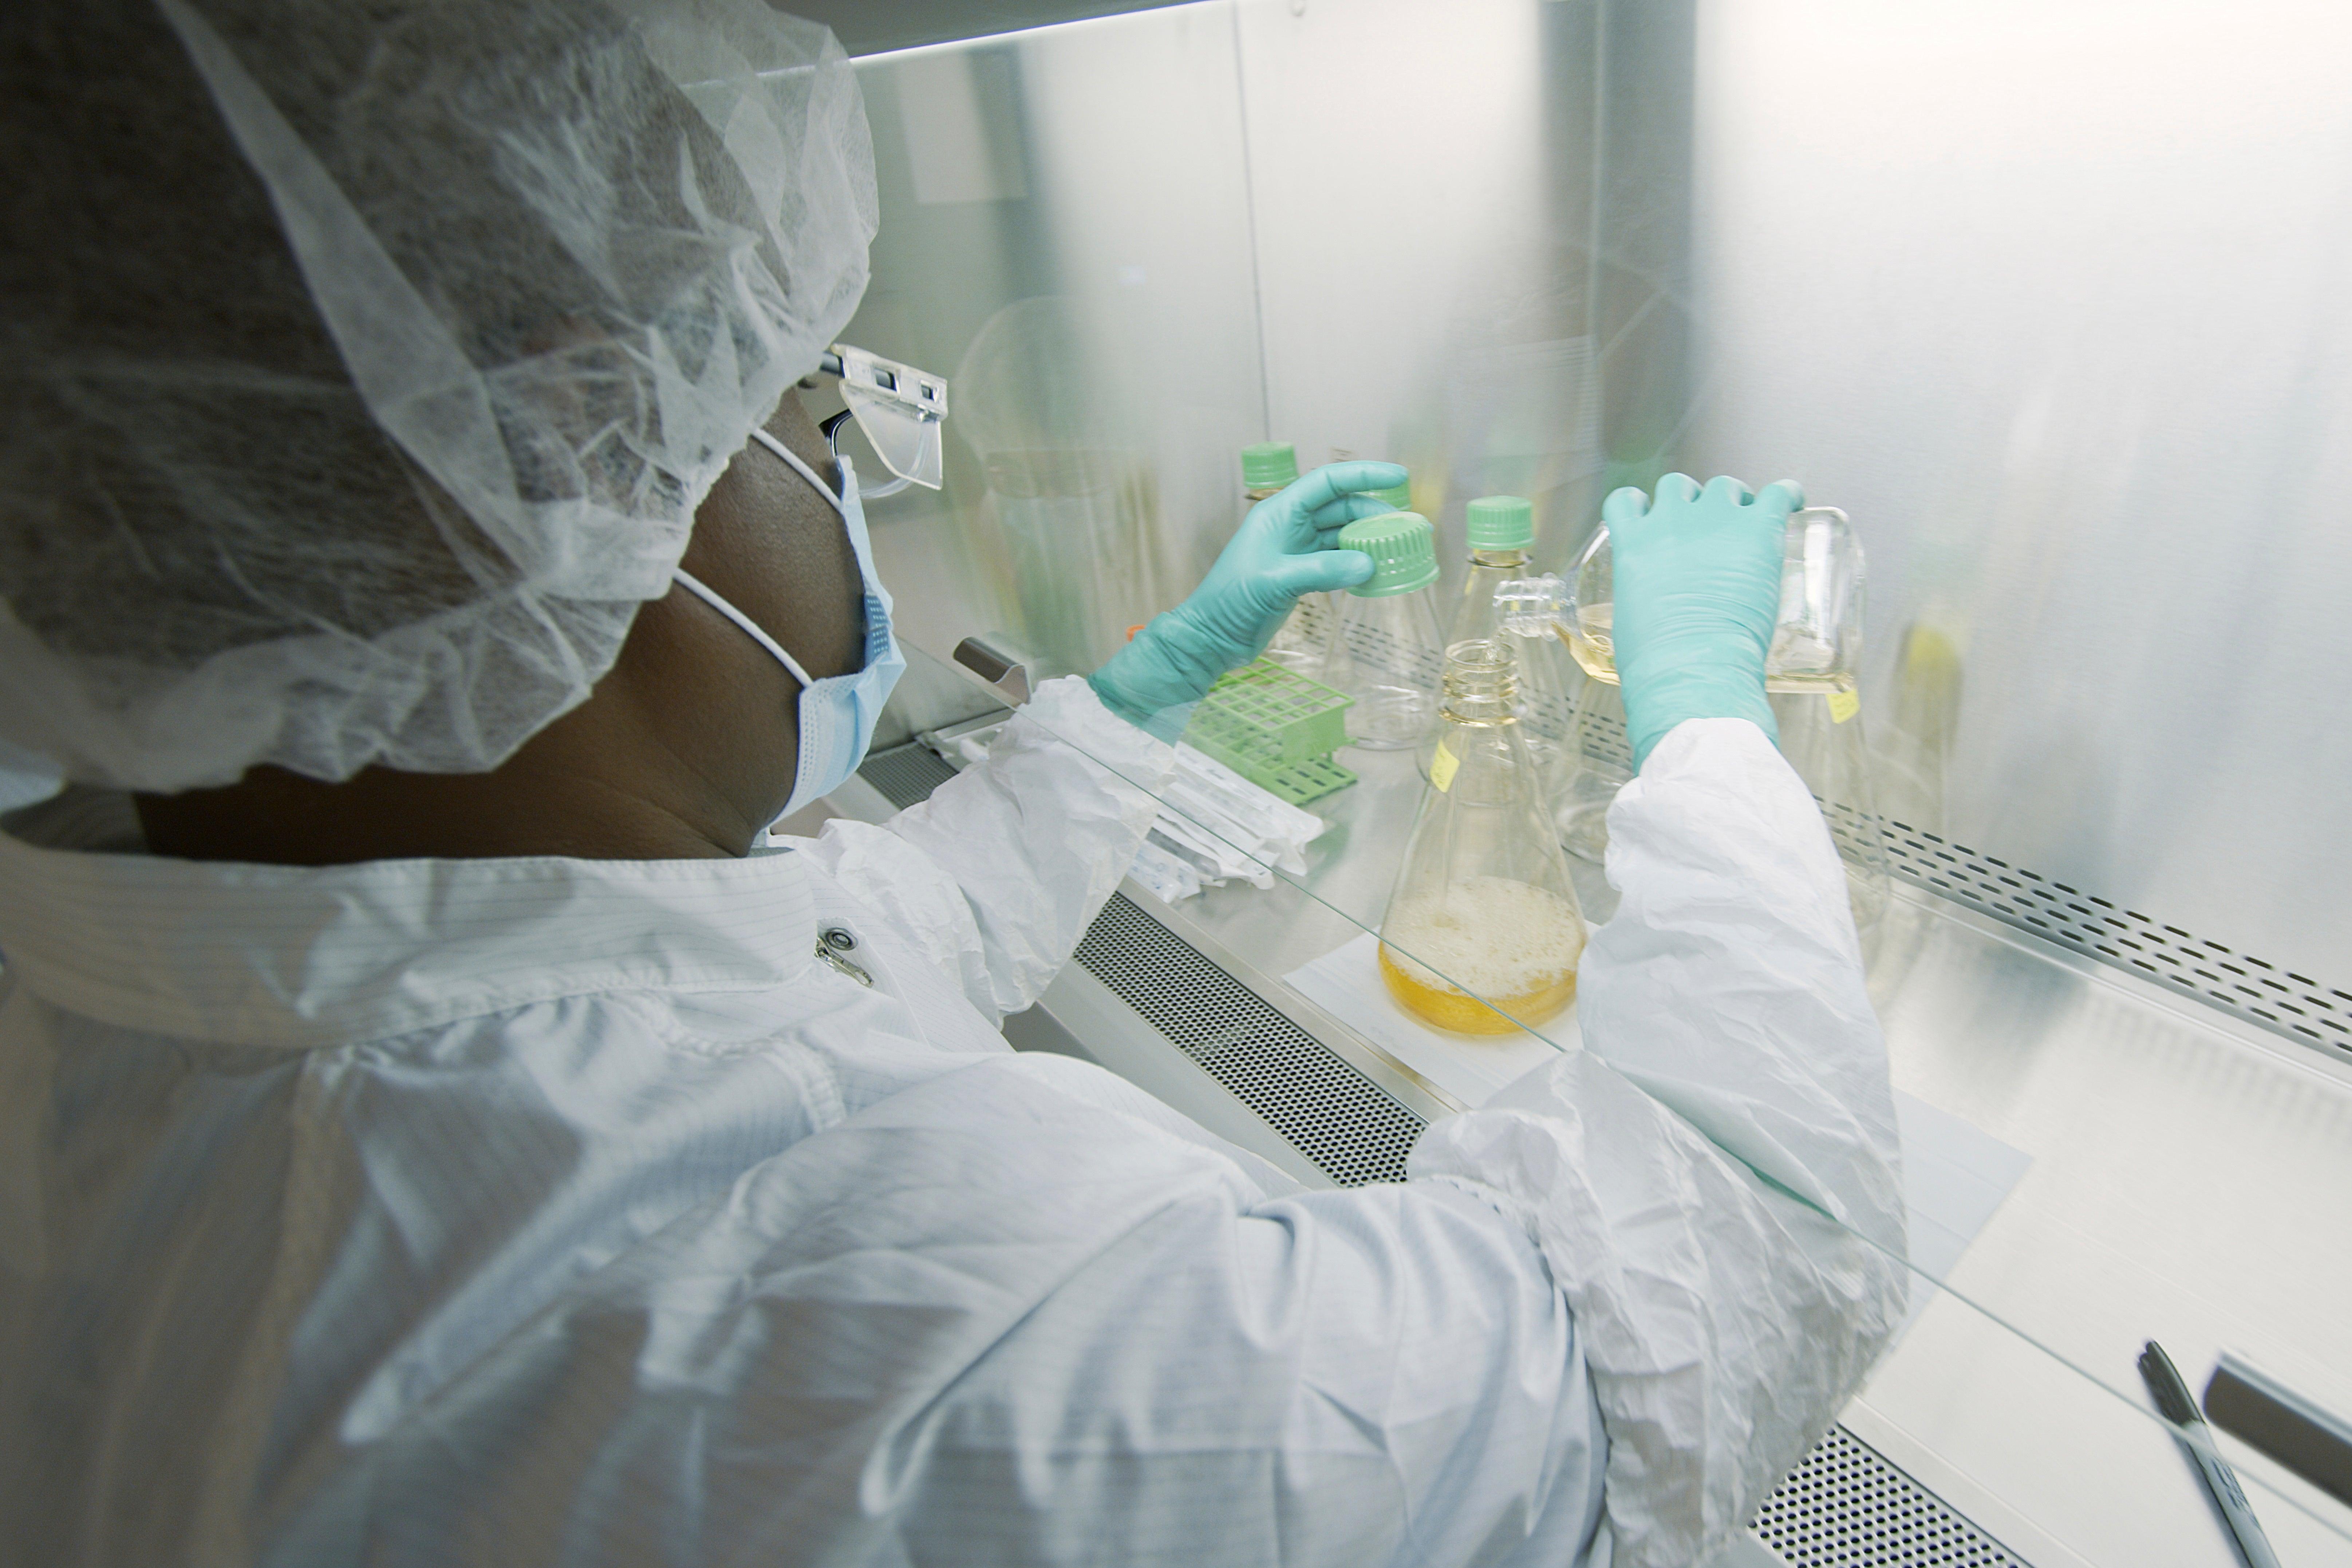 Covid: US halts study into promising antibody treatment